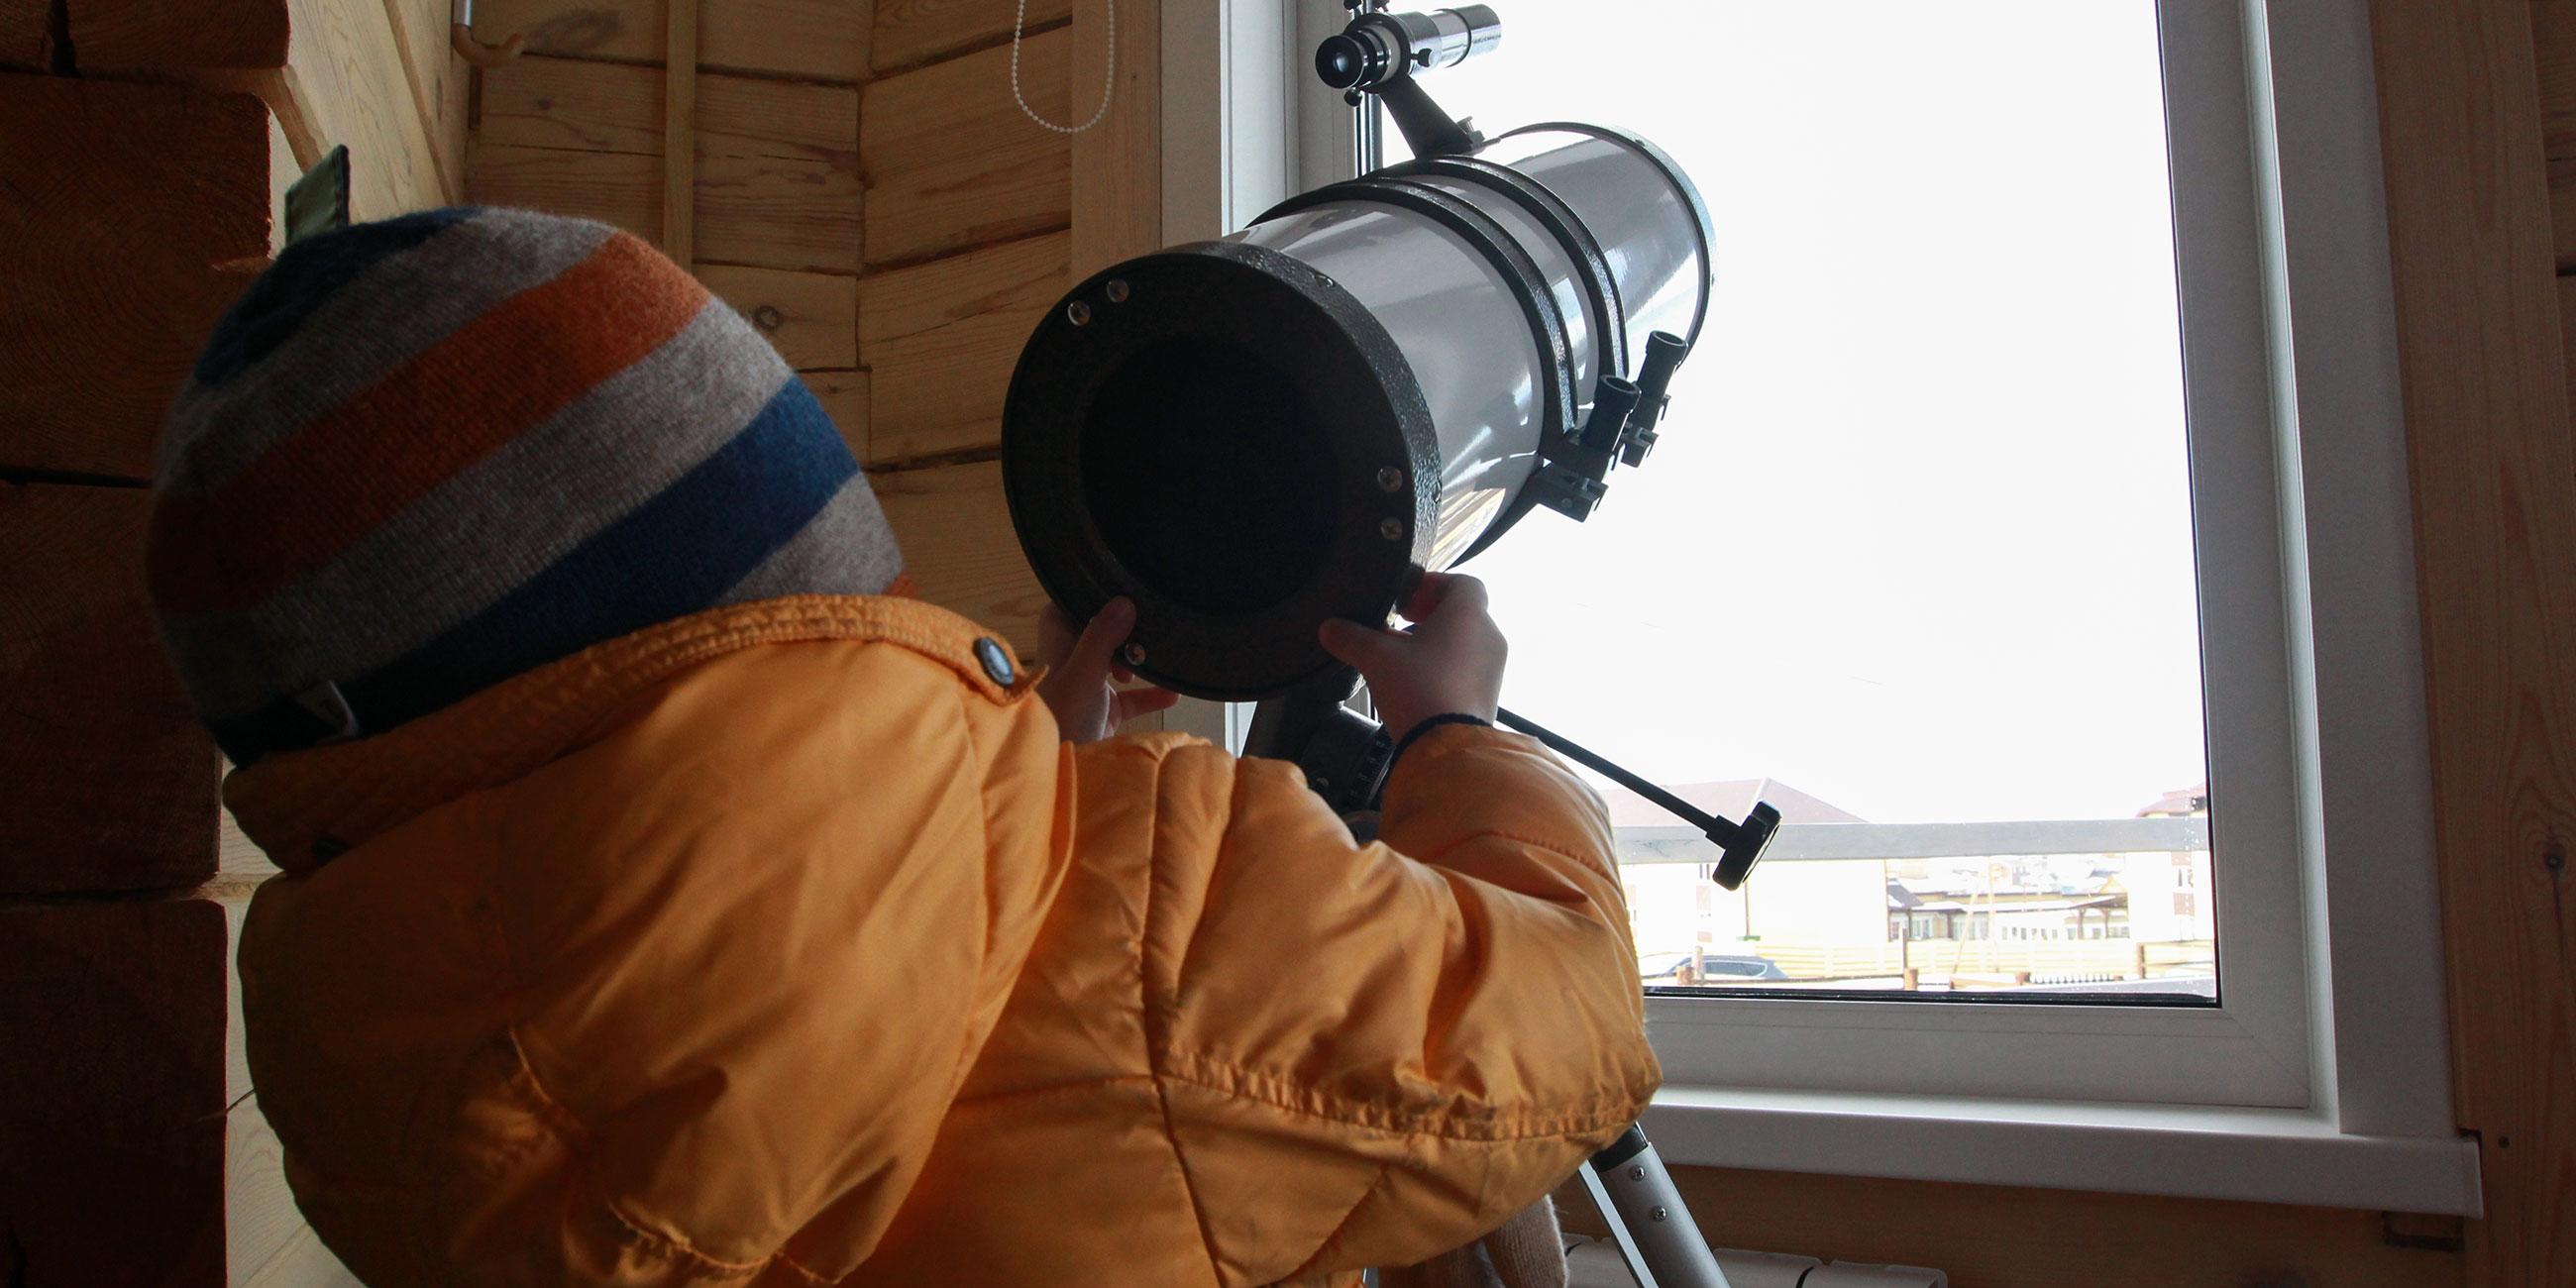 ребенок с телескопом